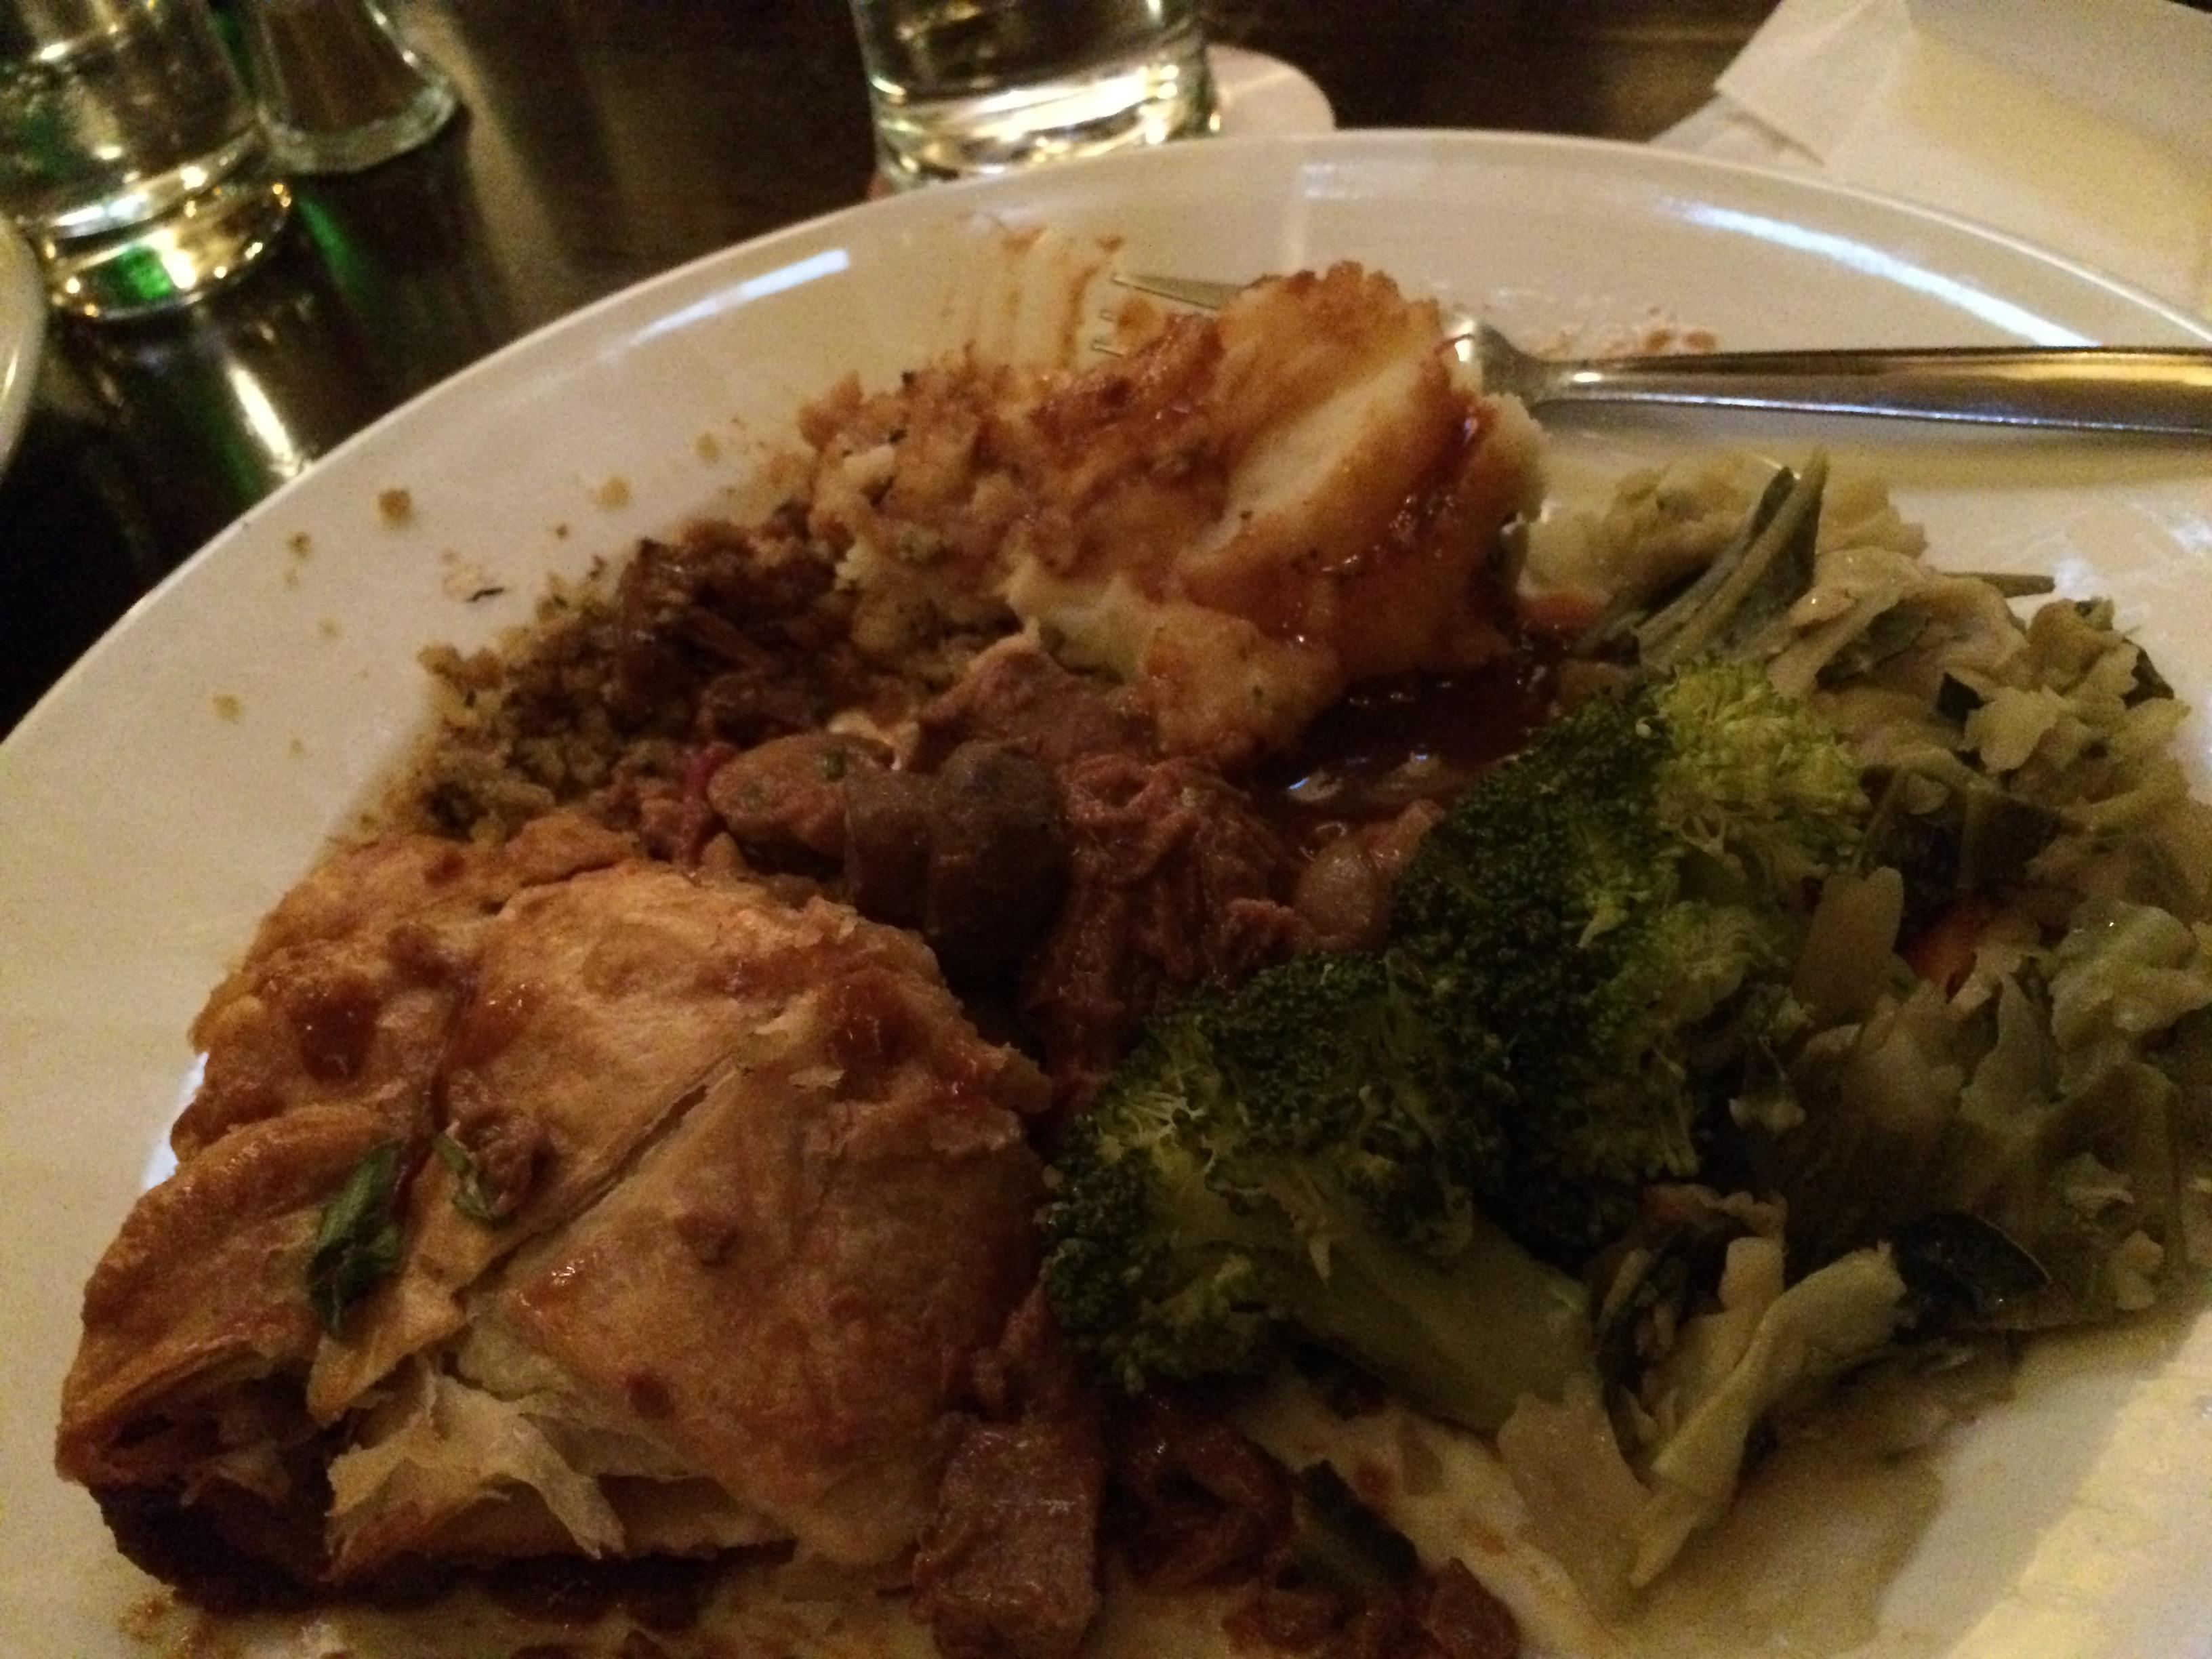 Sunday Roast at O'Neills Bar and Restaurant